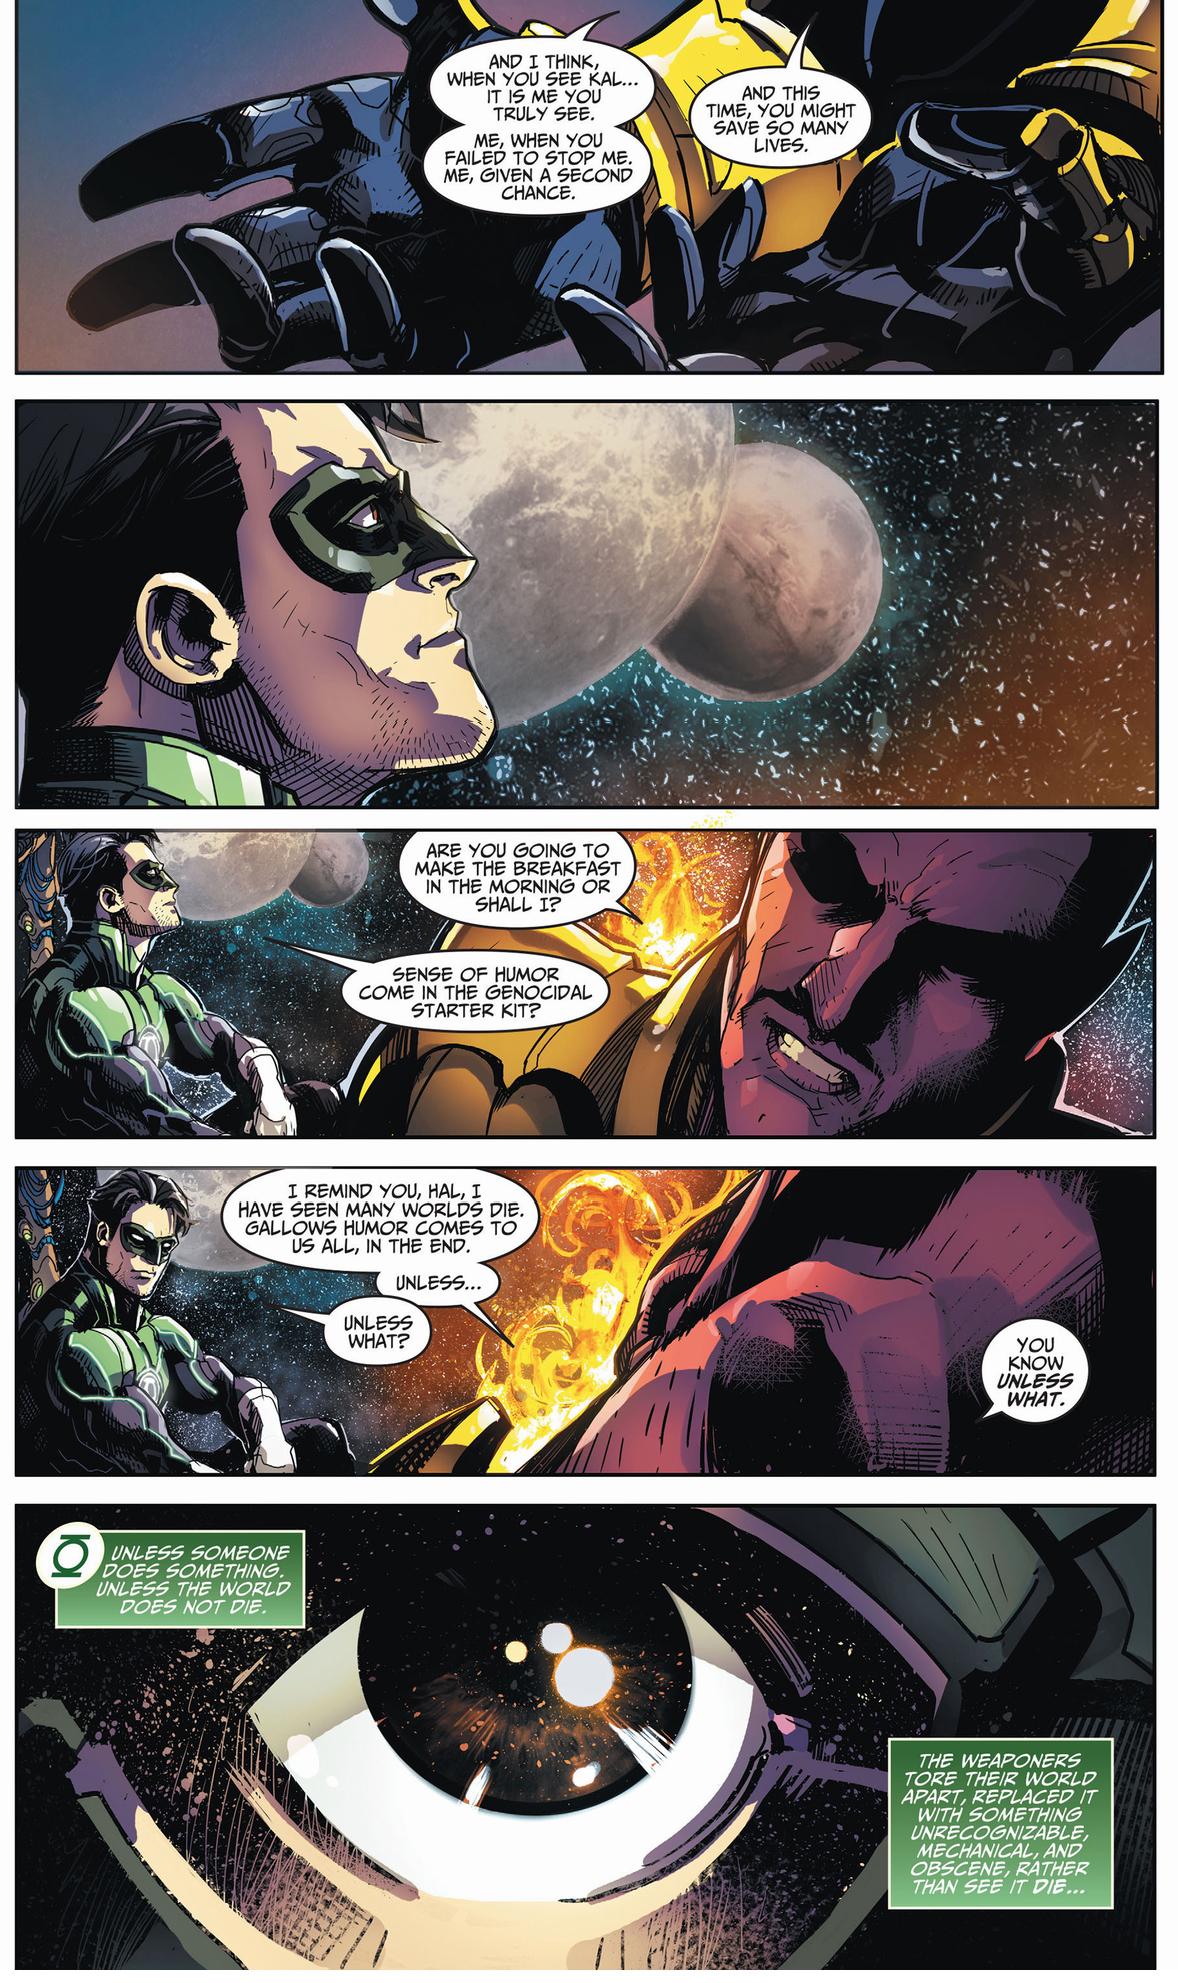 sinestro compares himself to superman